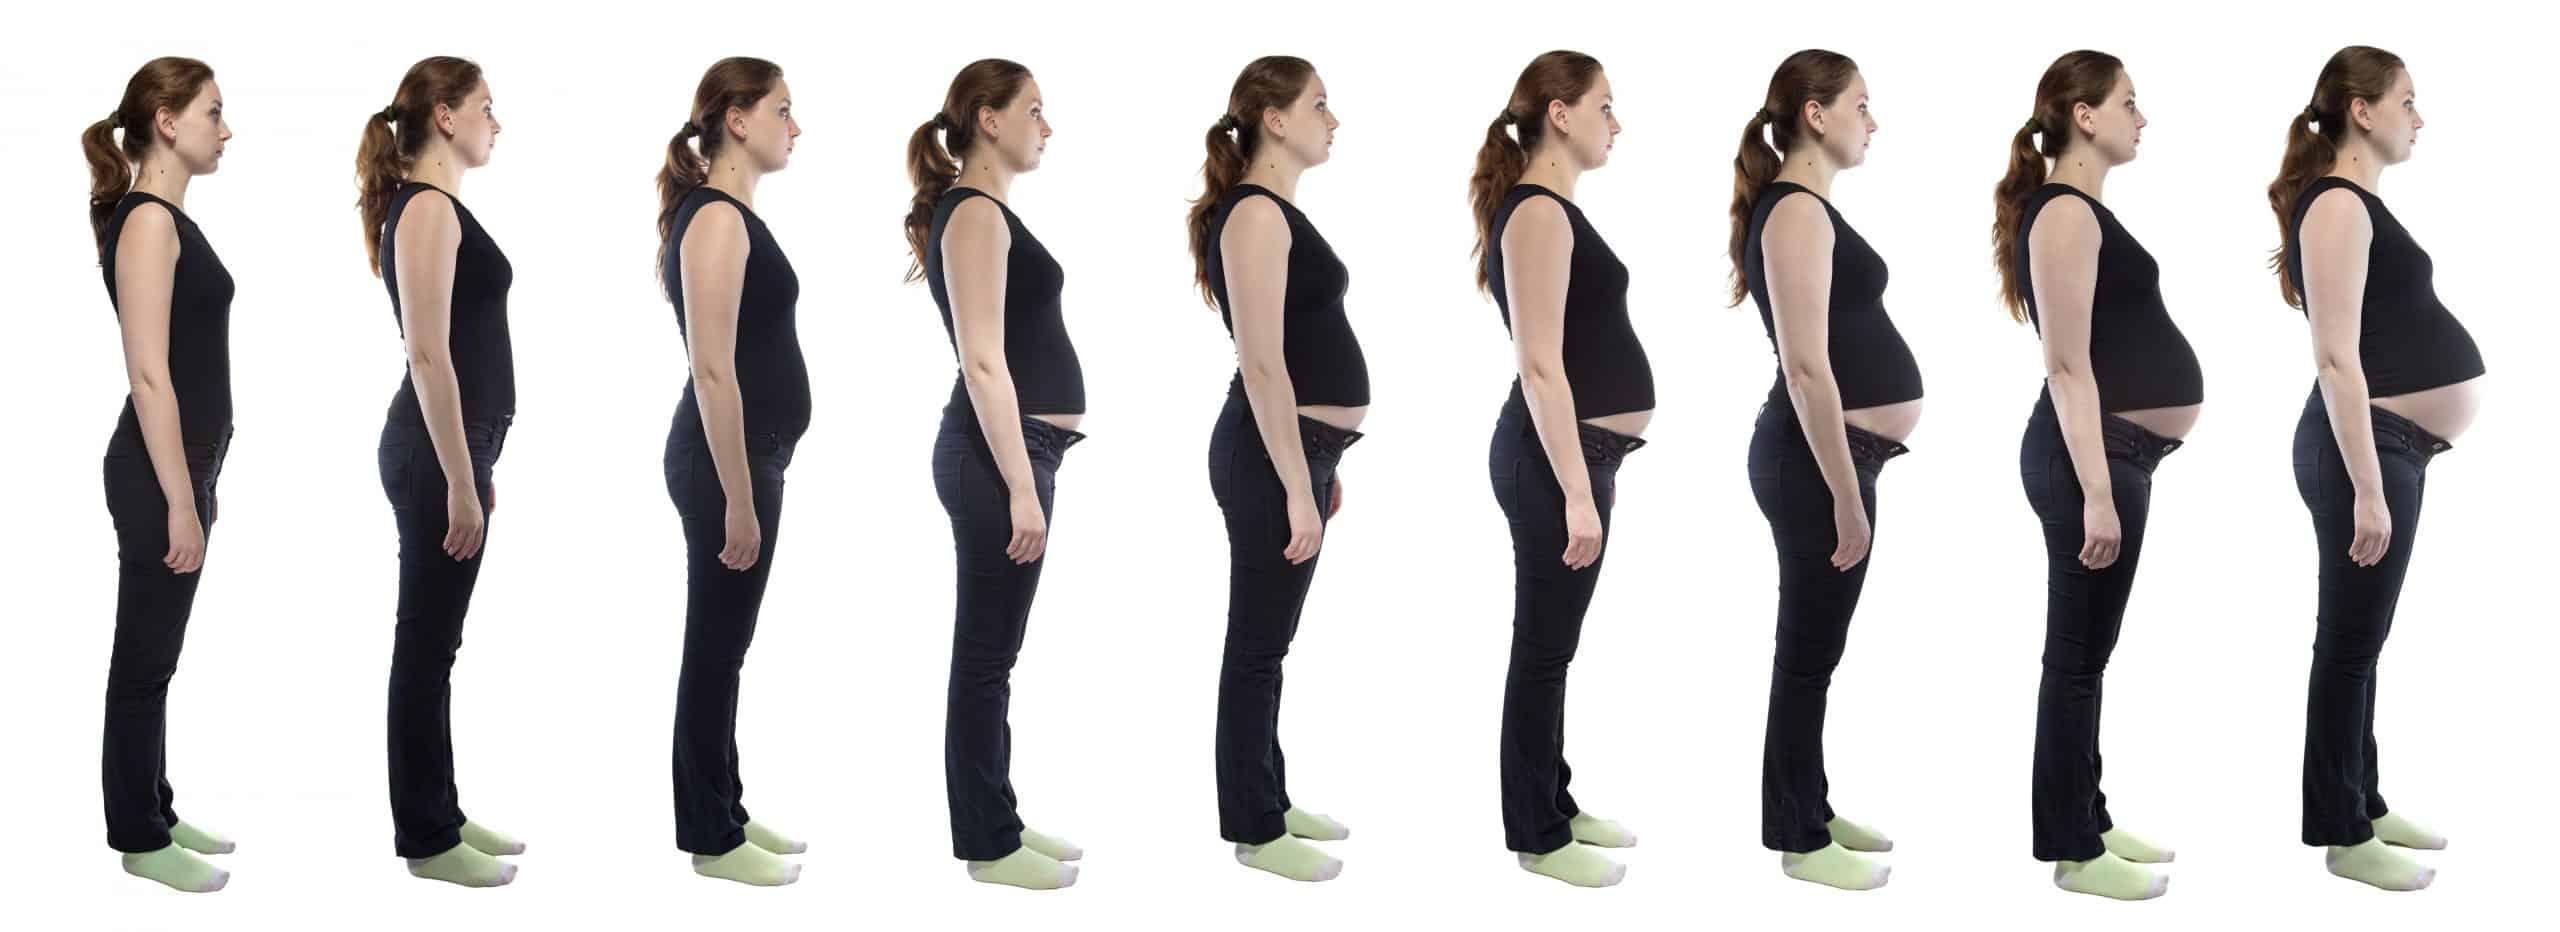 Stages Of Pregnancy By Week